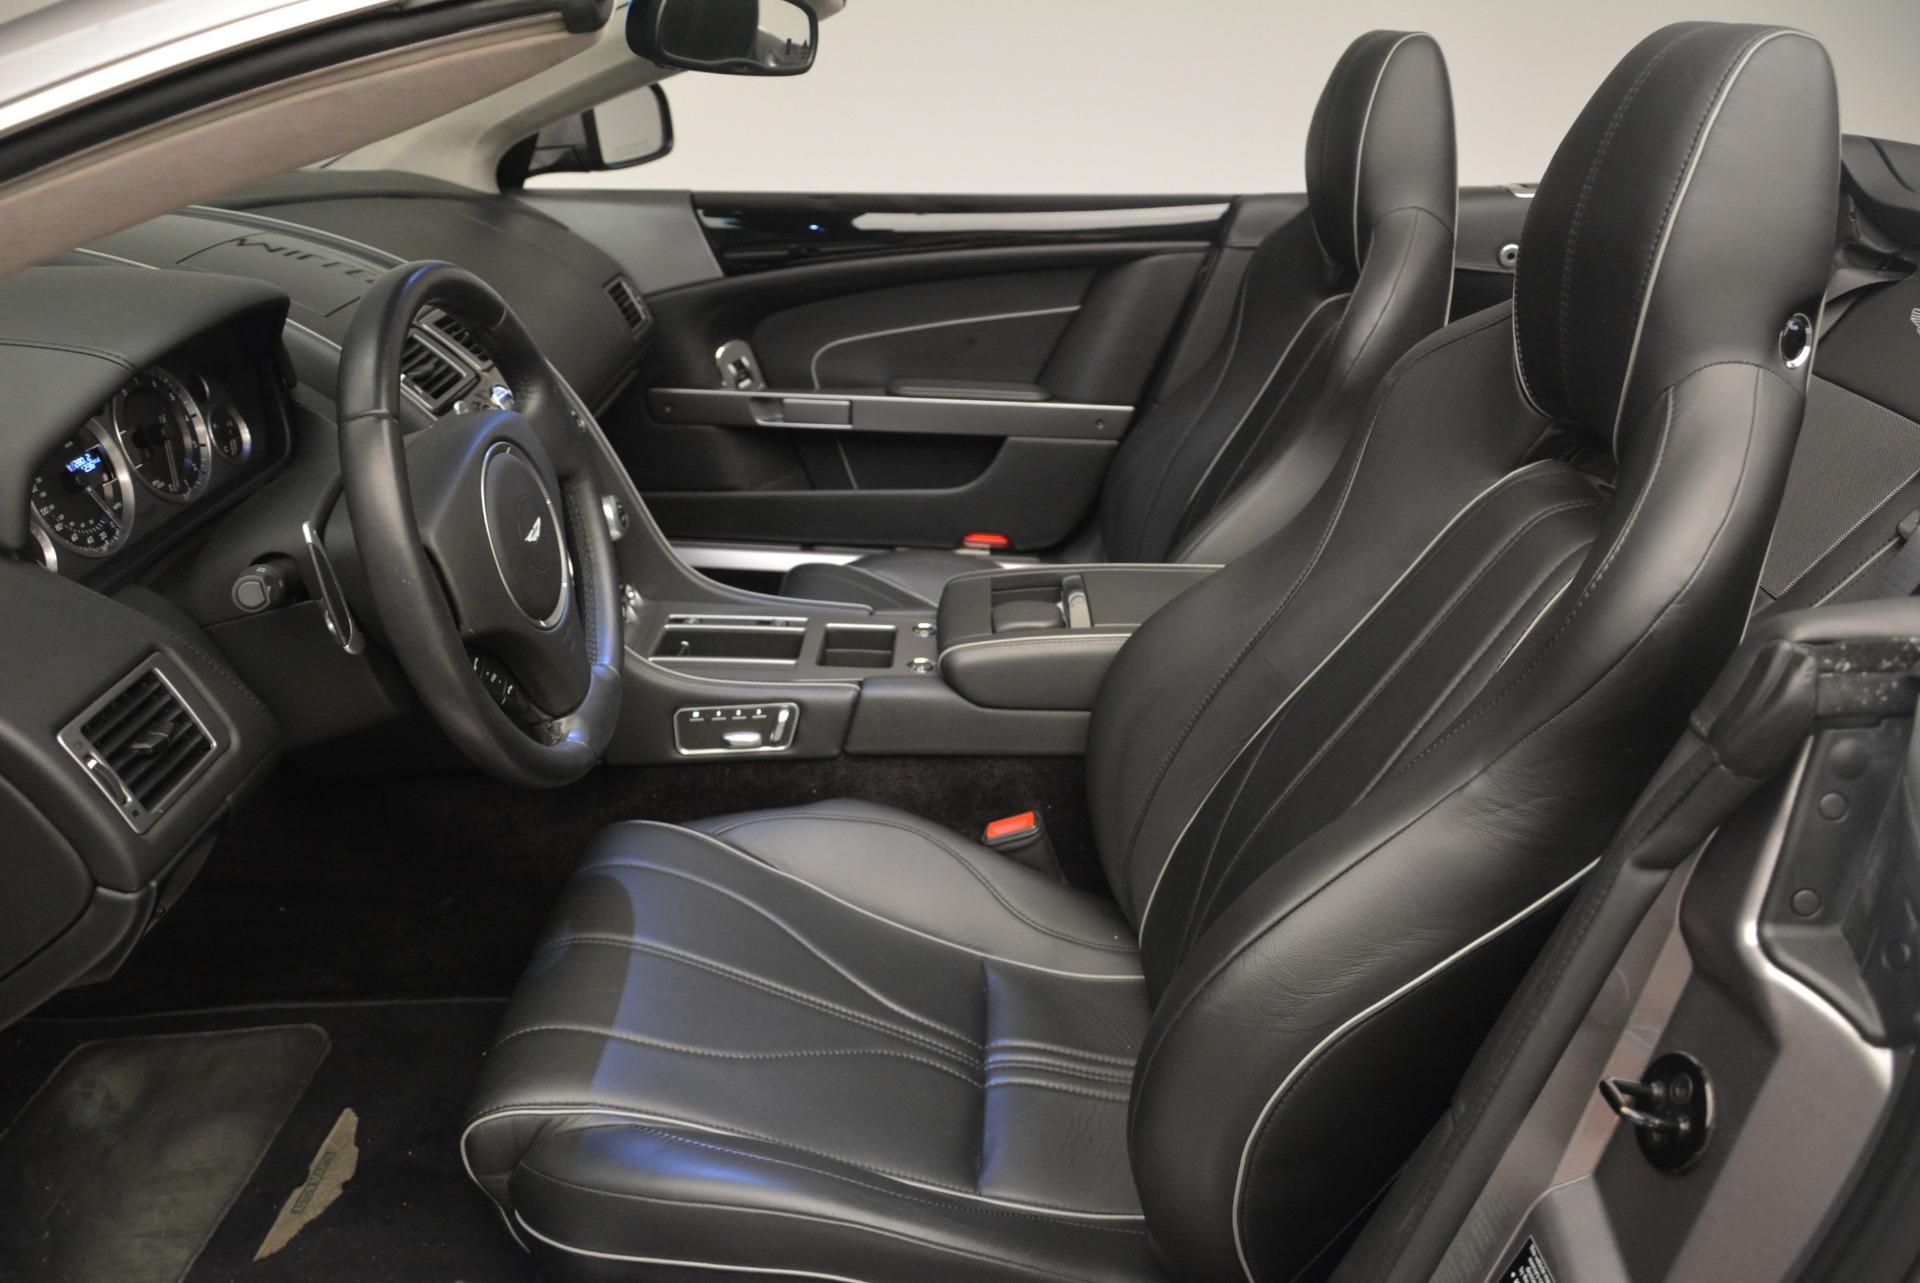 Used 2012 Aston Martin Virage Volante For Sale In Westport, CT 2378_p25